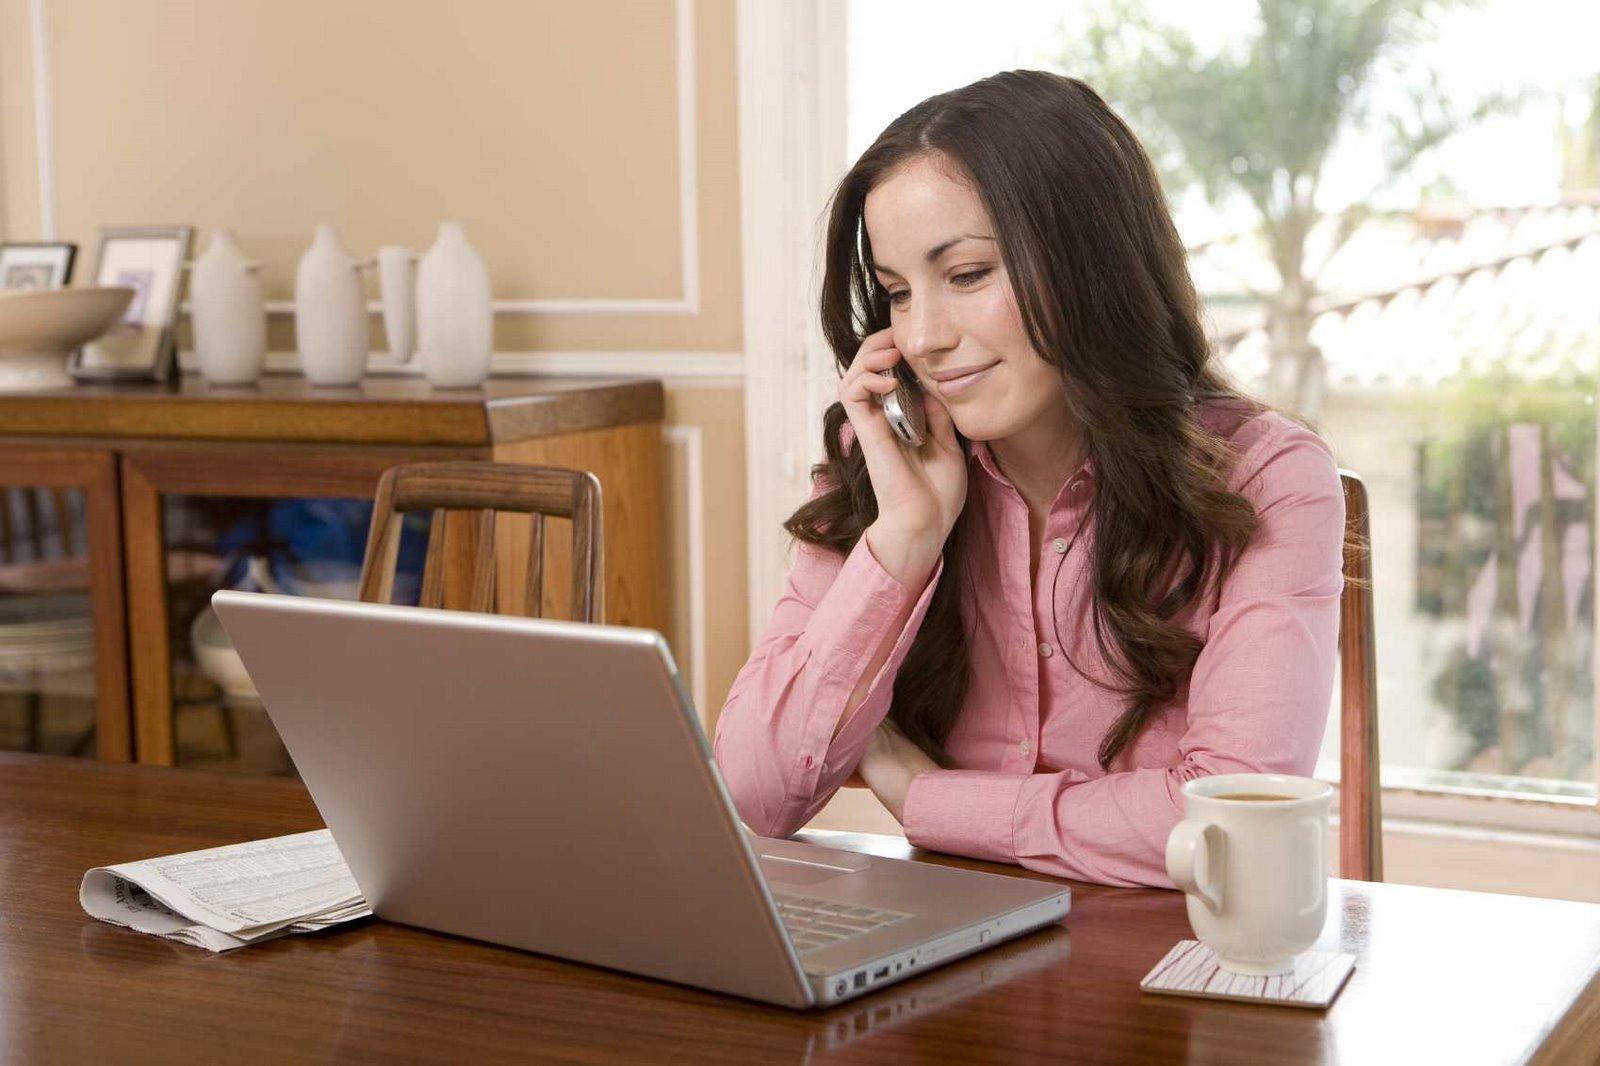 Psicoterapia Online Internet Salud Digital Tecnología Legal Ética Doctor TIC